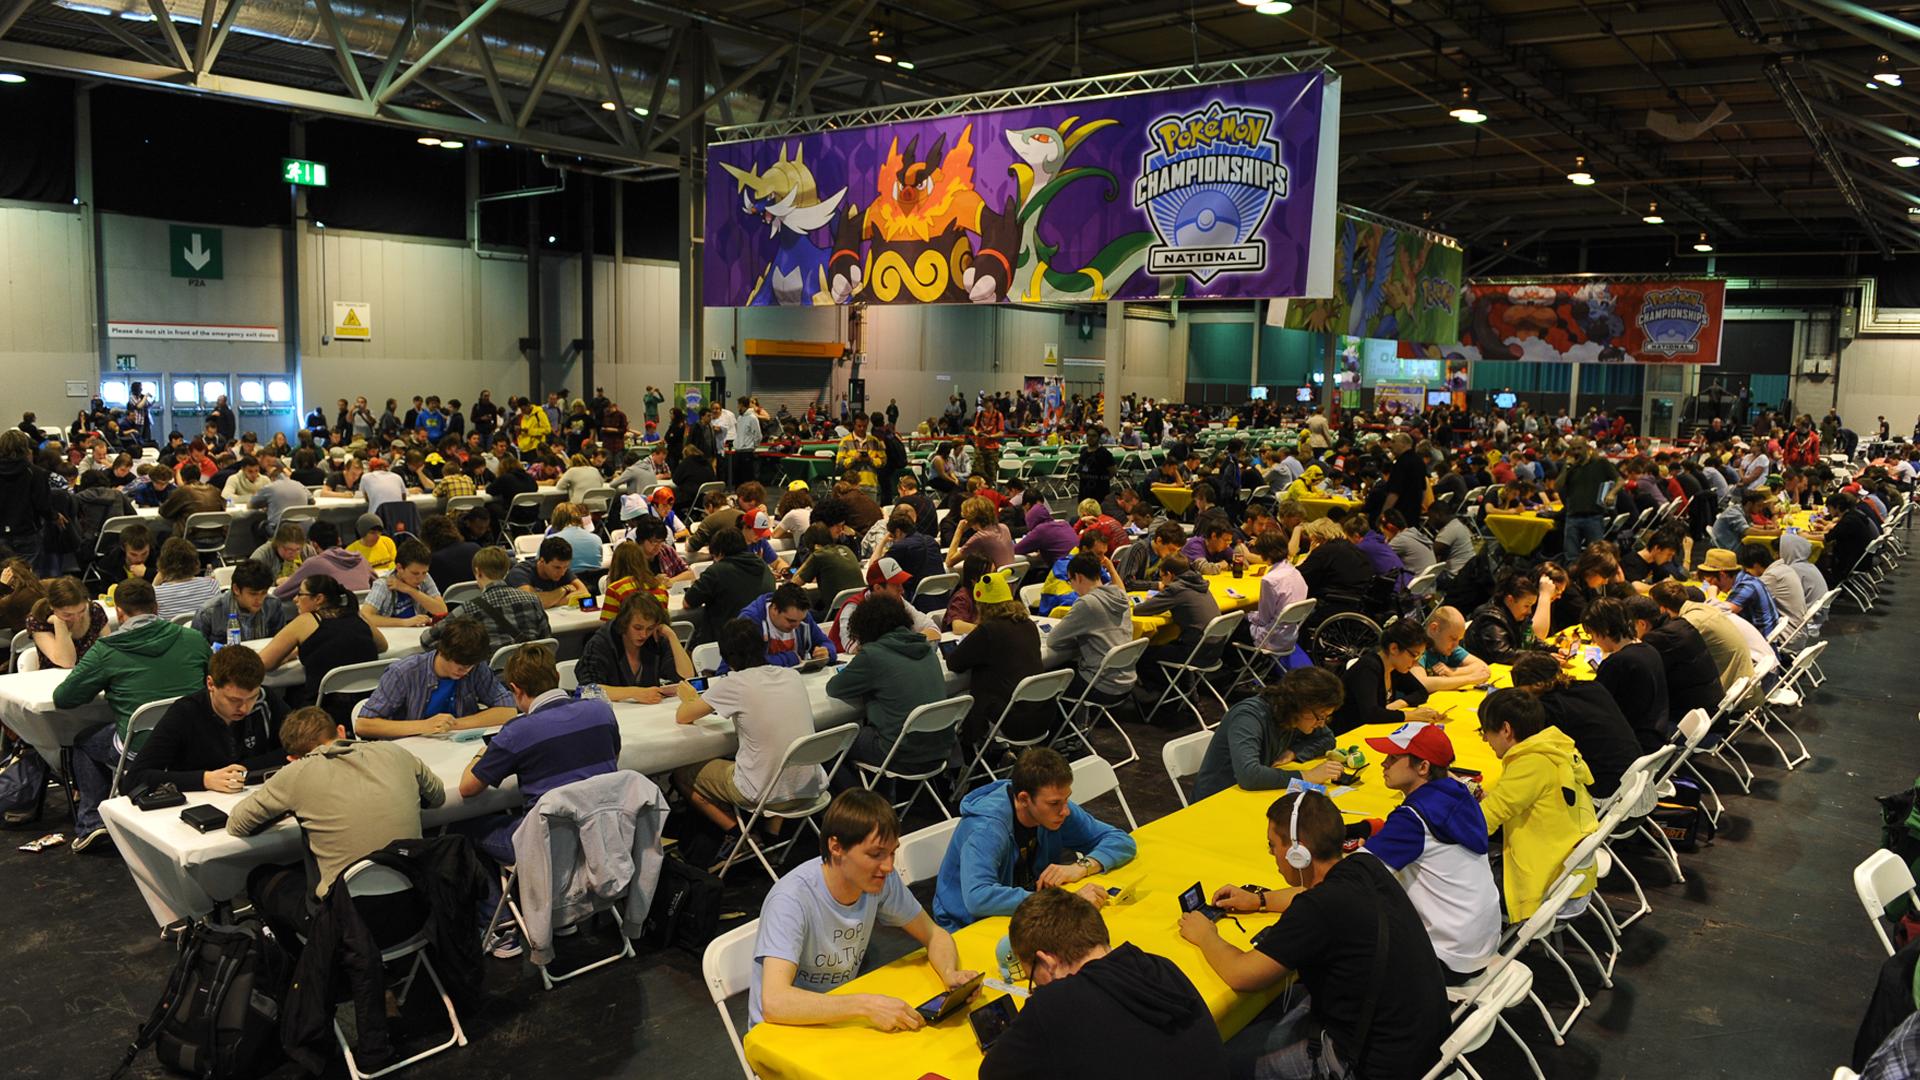 Pokémon tcg championship image